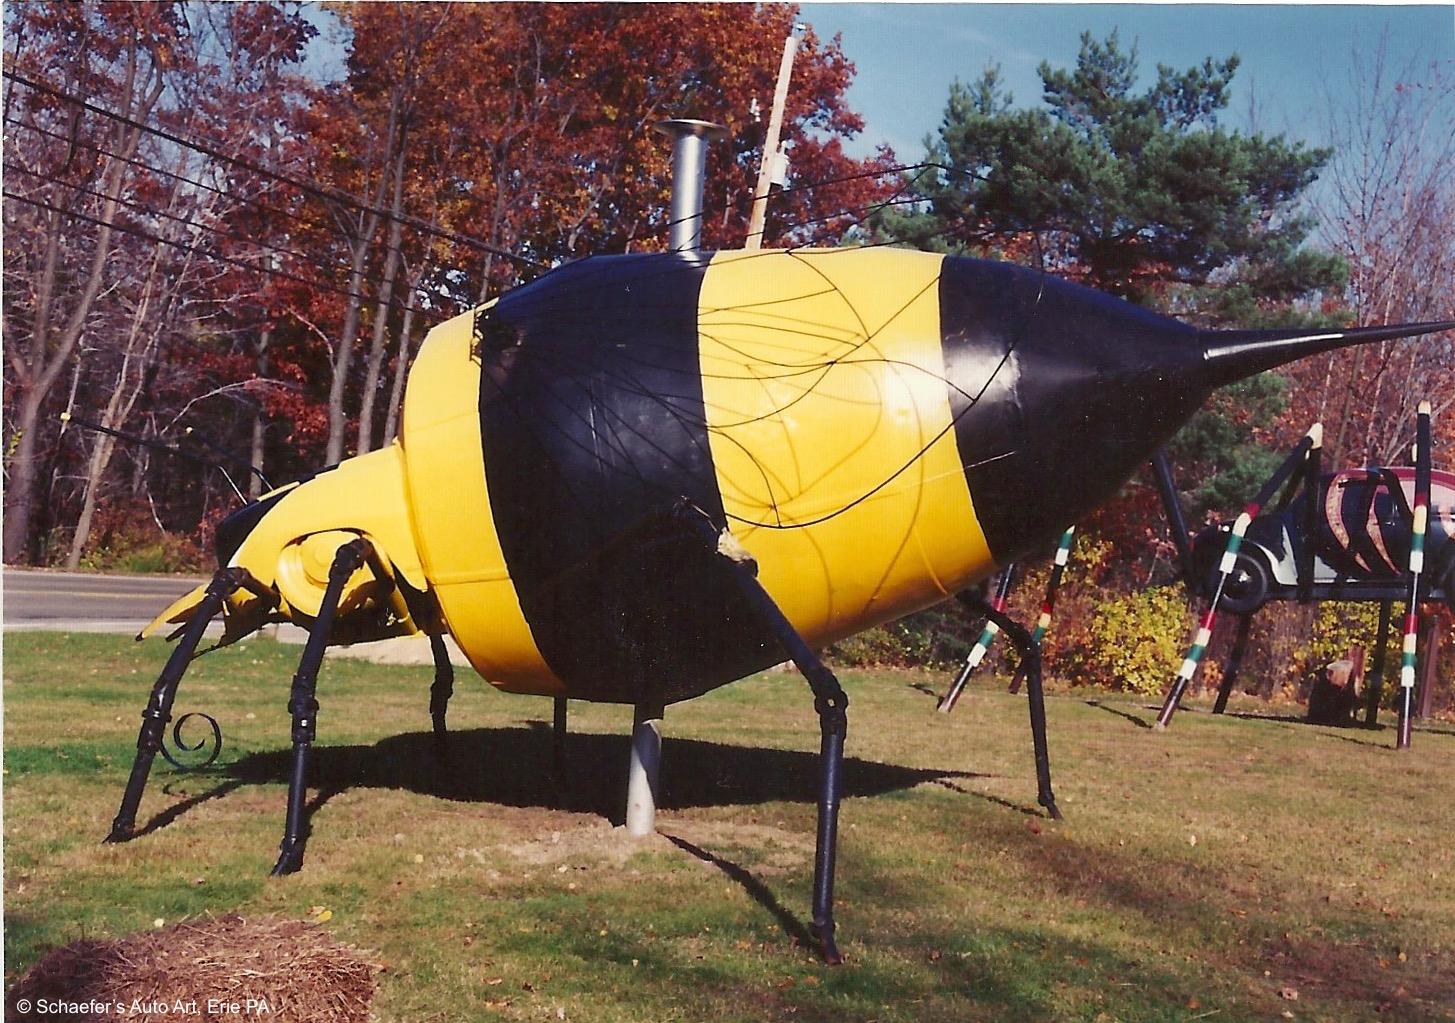 Bumblebee_Schaefers Auto Art8.jpeg